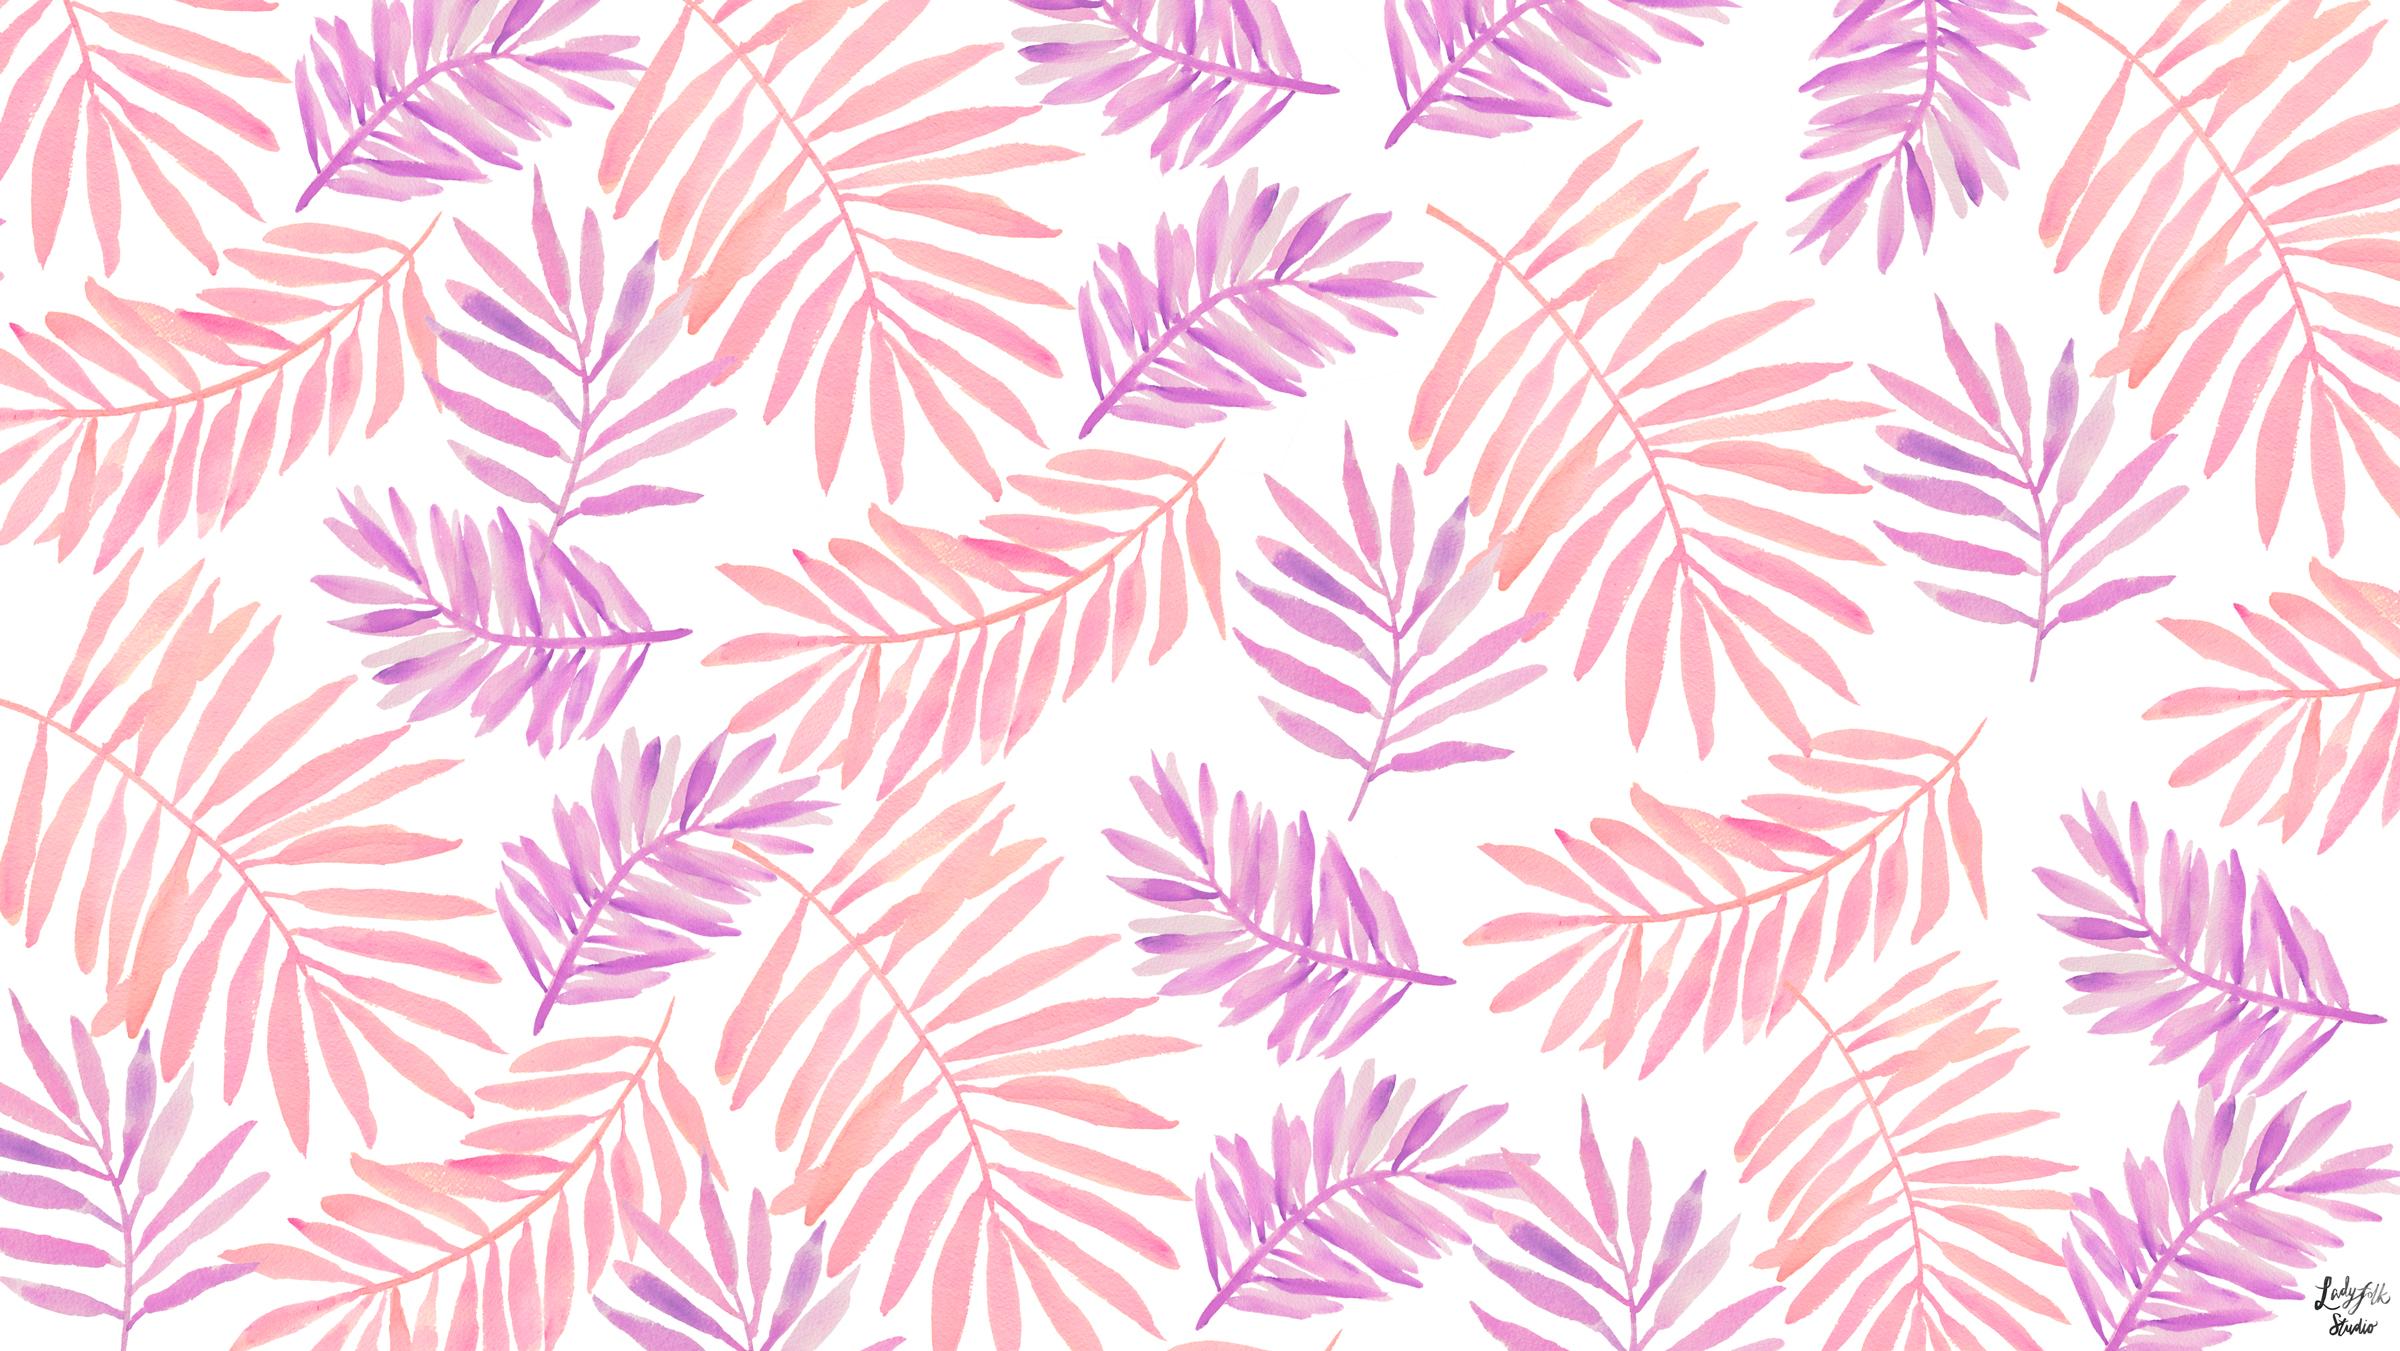 LadyfolkStudio-July-desktop-watercolor-art.jpg